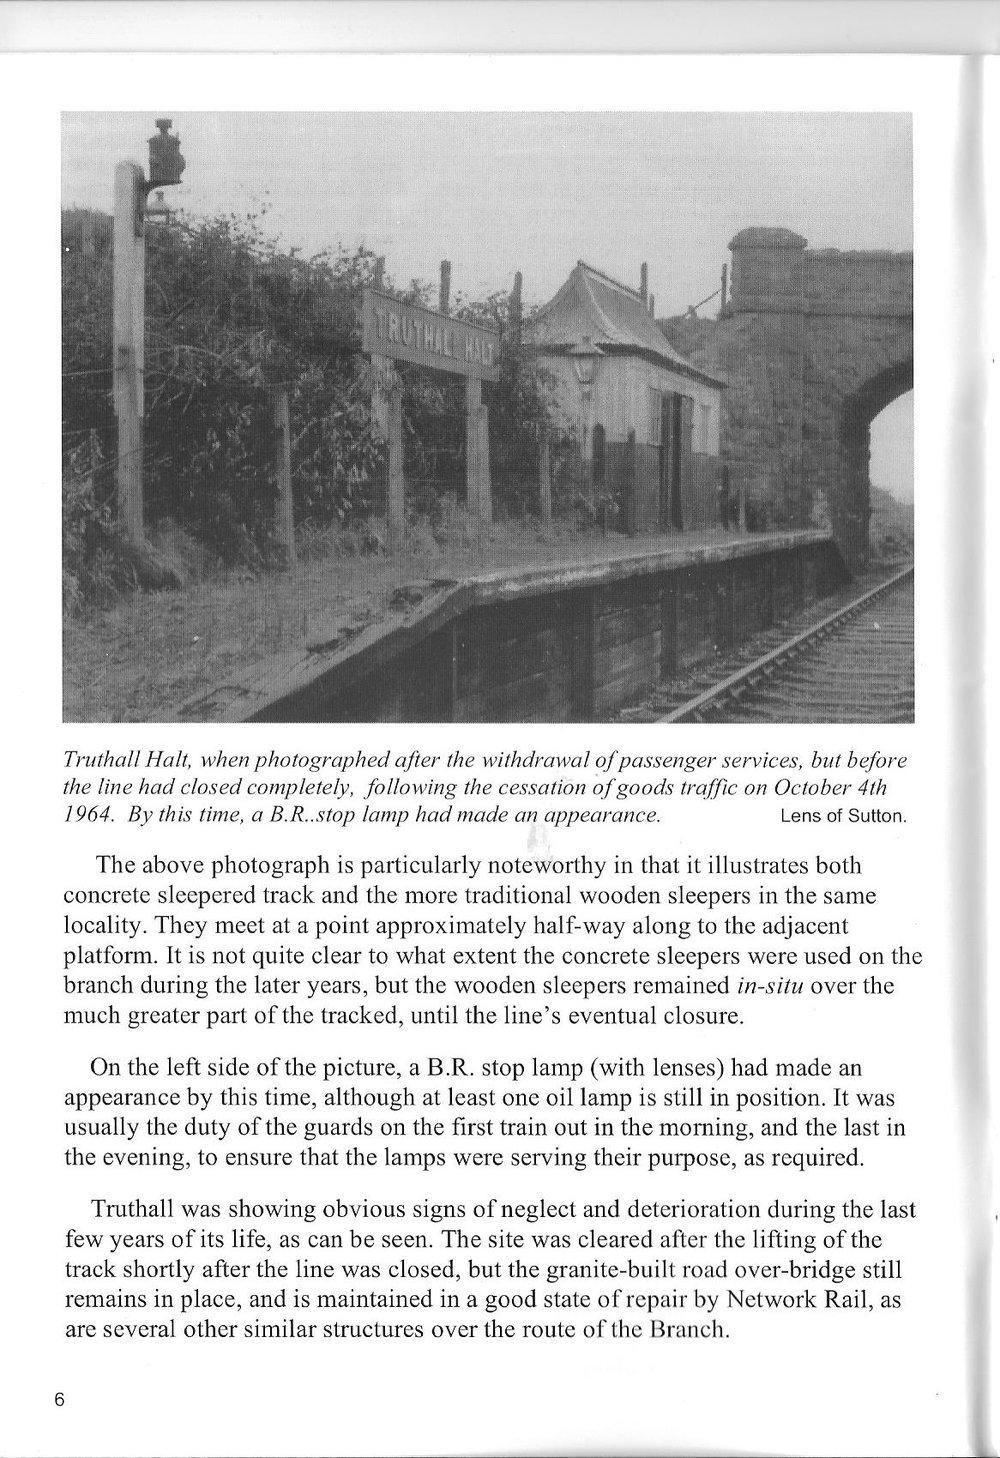 2007 Helston Railway Journal - Truthall 3.jpg